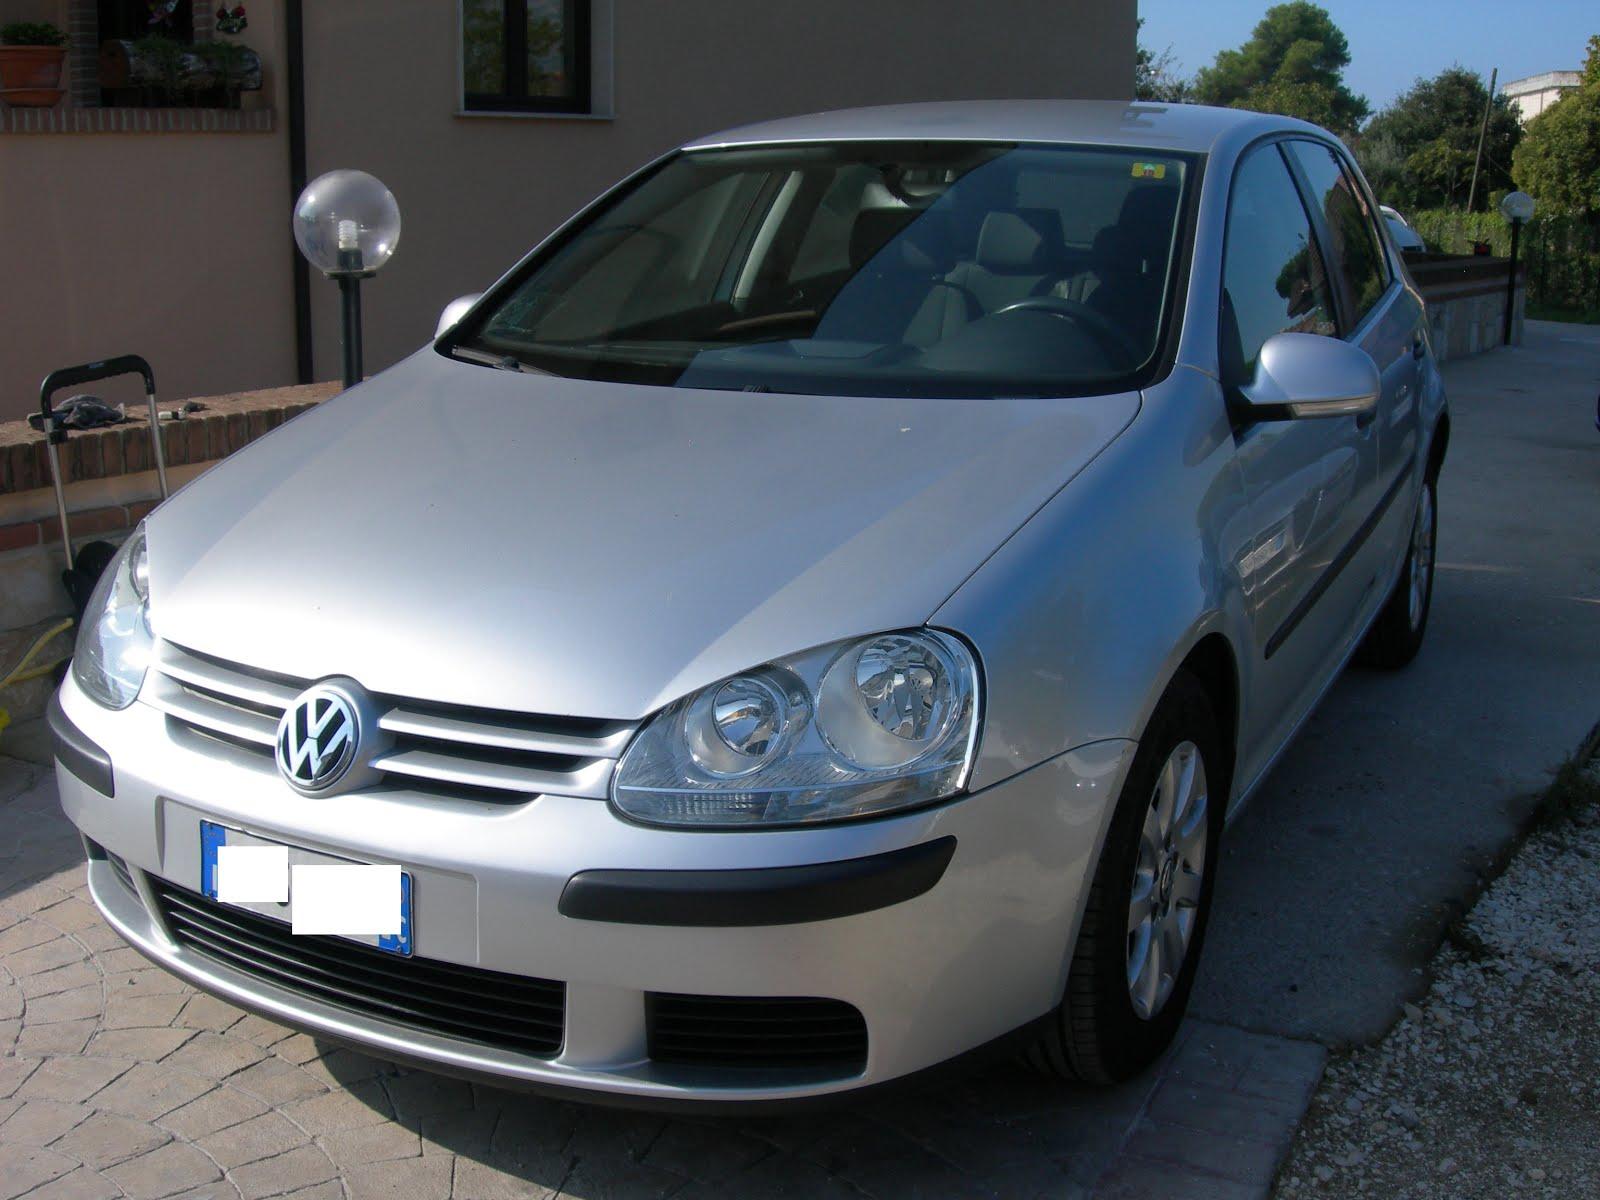 VW GOLF 5 1.9 TDI 105 CV HIGHLINE ANNO 2005 PREZZO 6.000,00 EURO